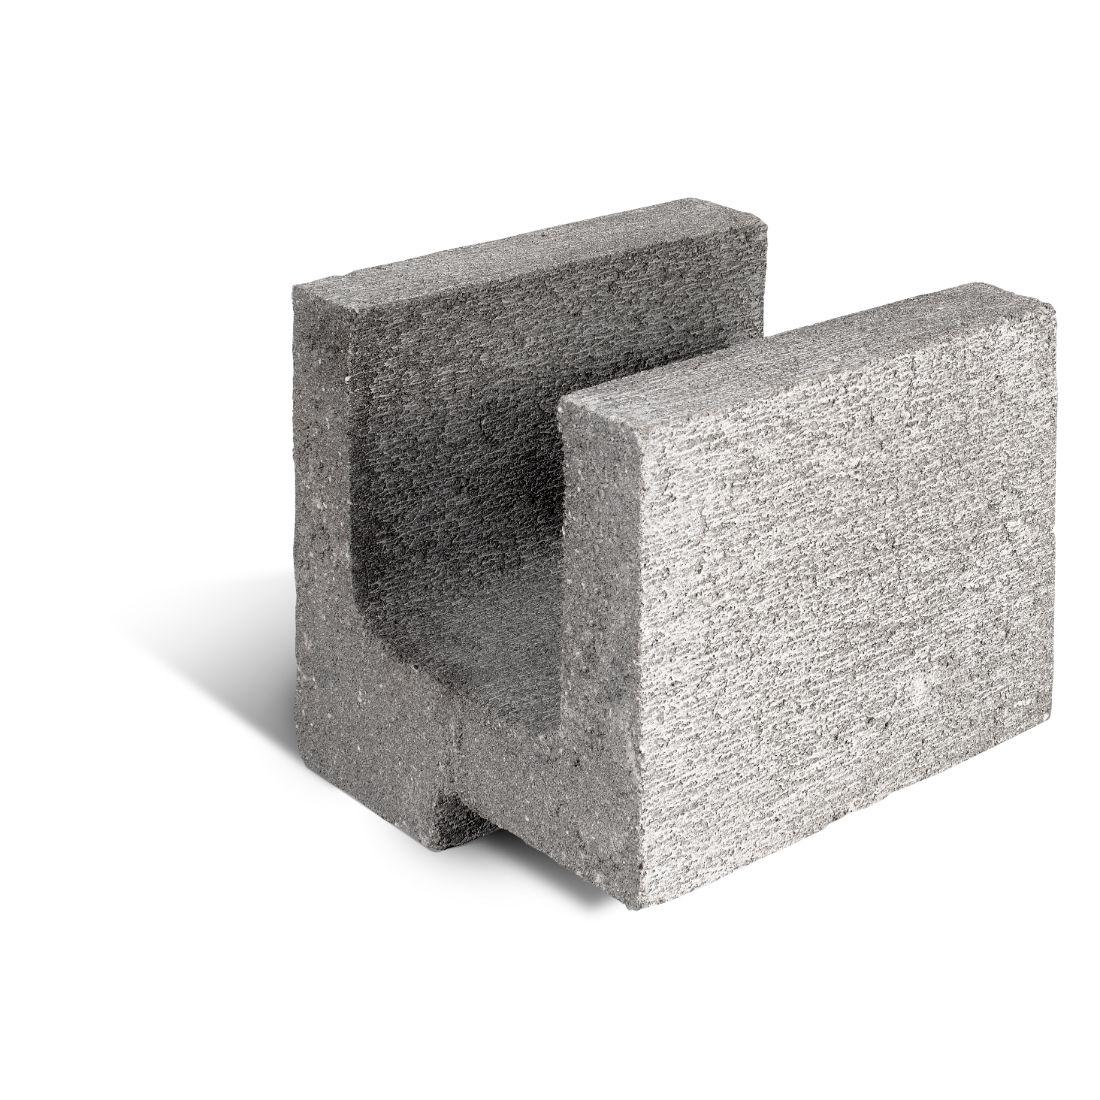 20.11R Rebate Lintel Block 190 x 190 x 190mm